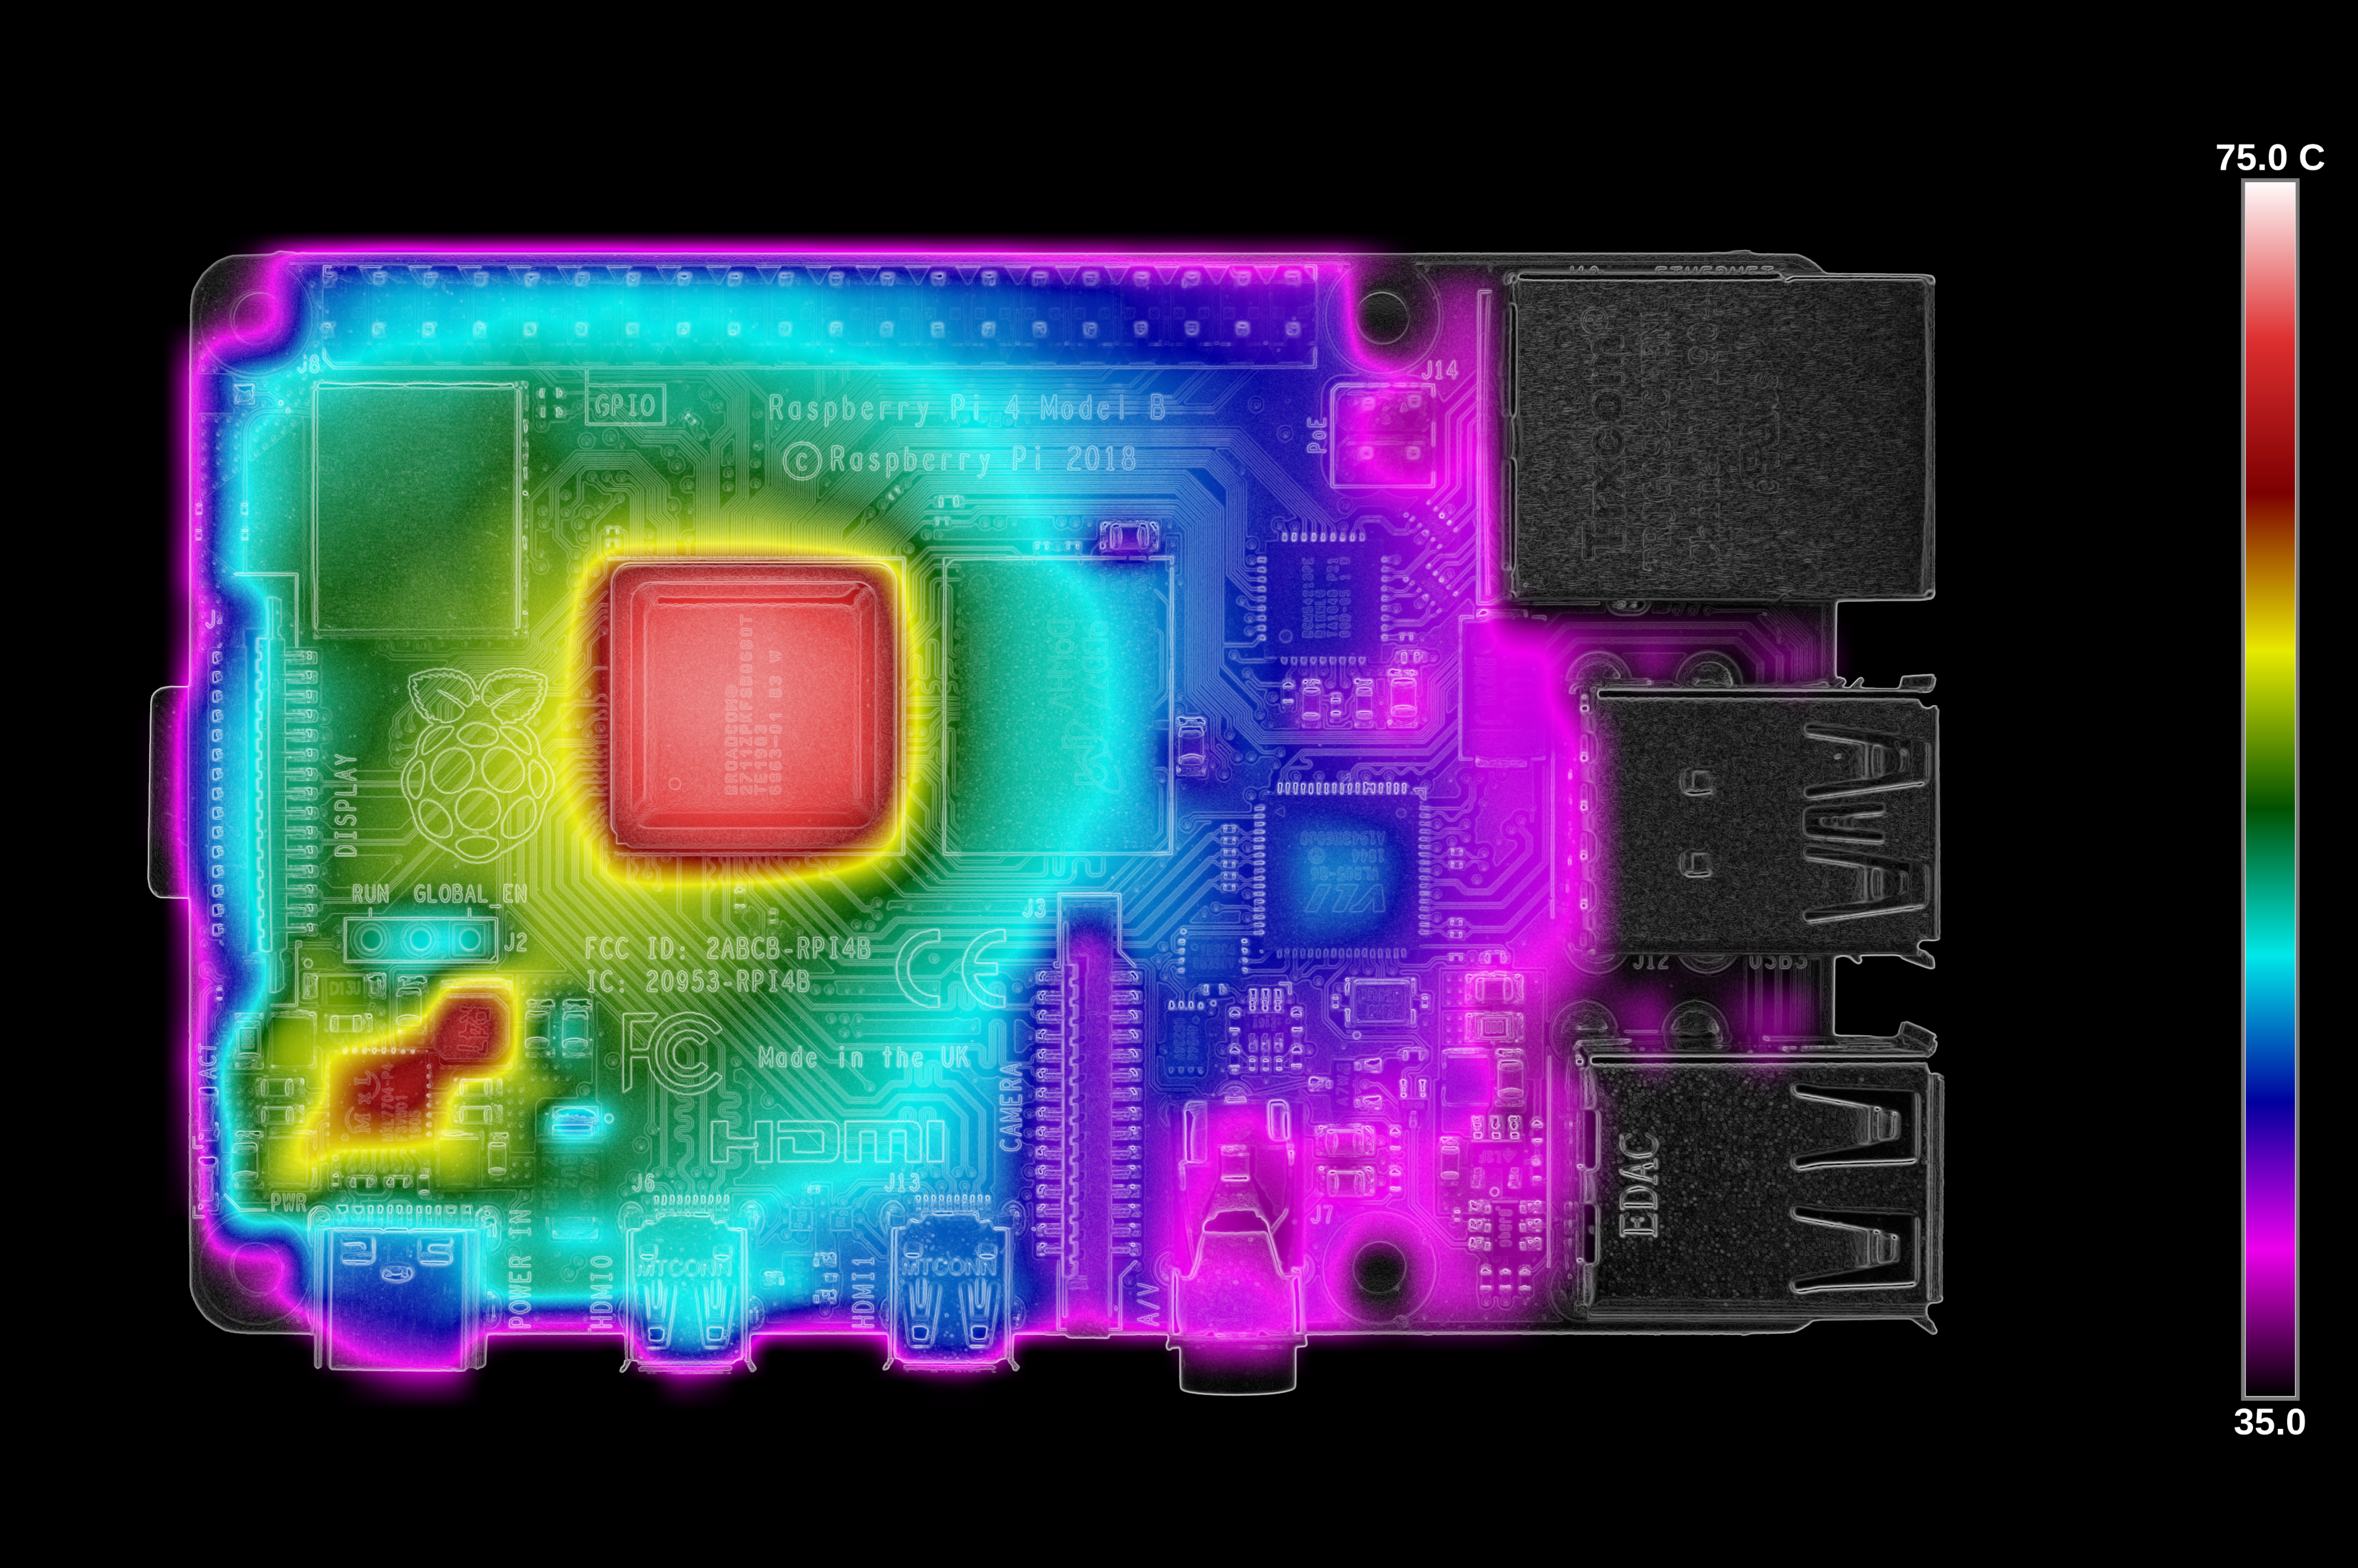 Тестирование Raspberry Pi 4 на нагрев - 20